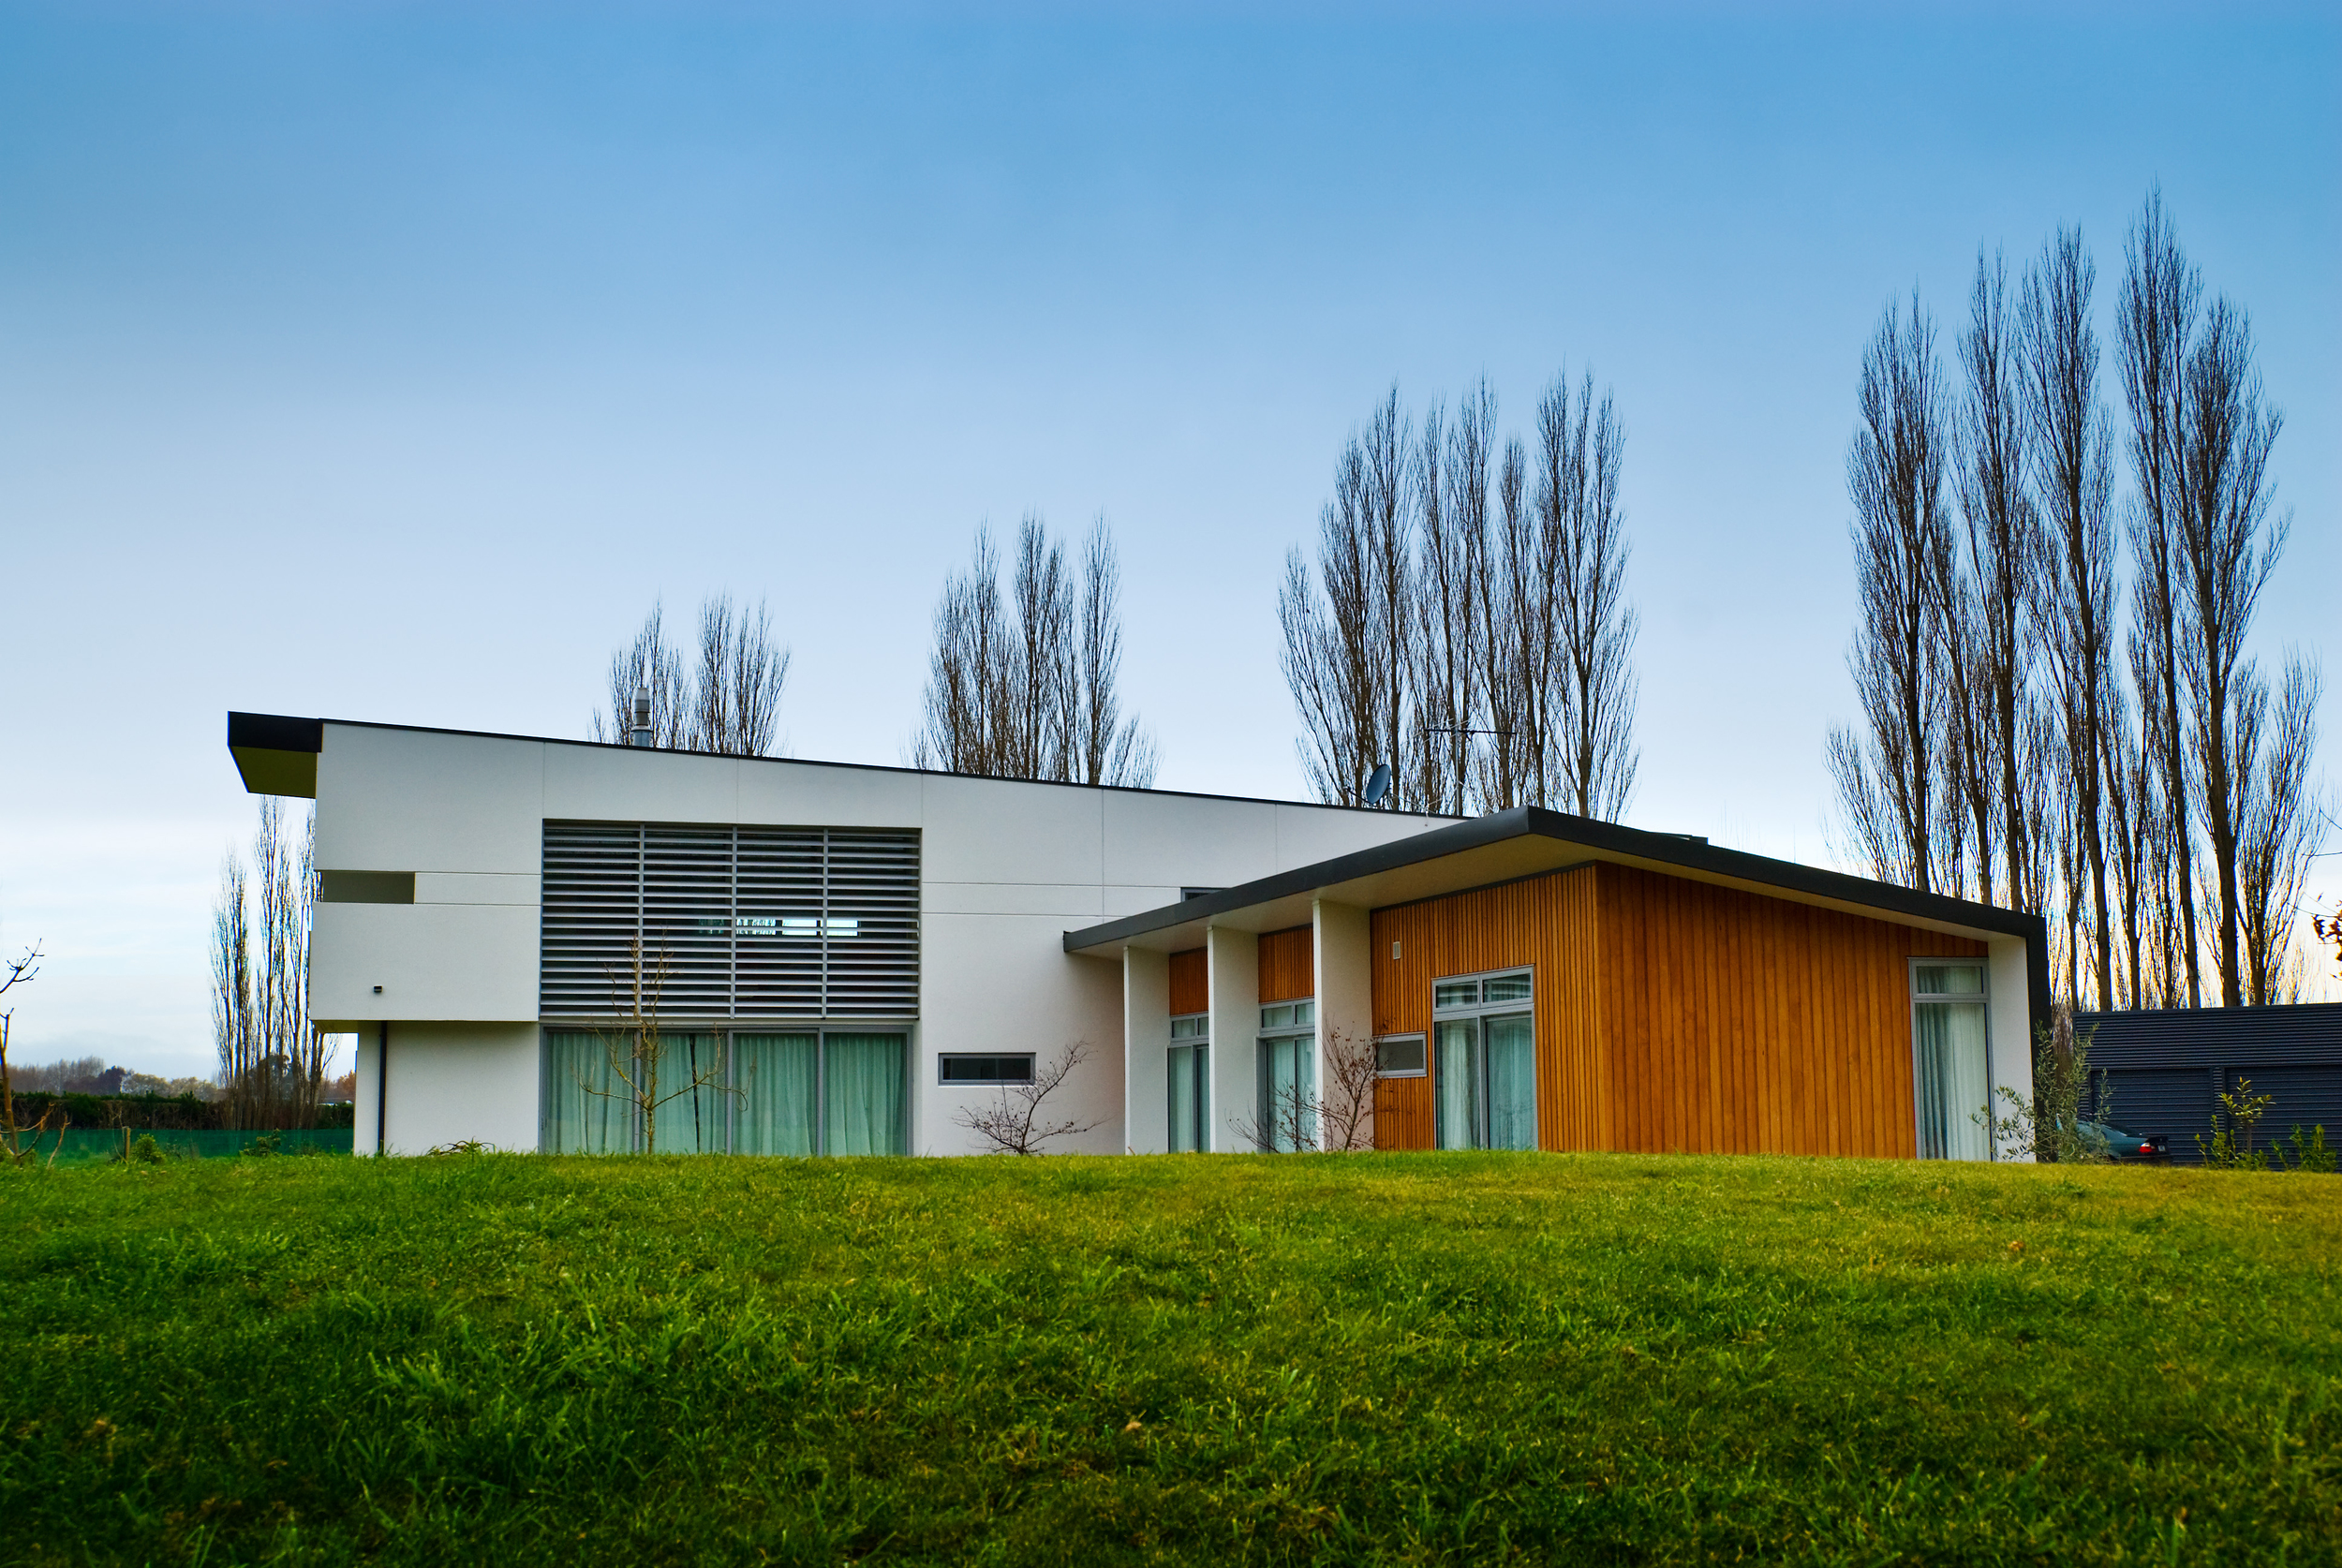 090614_Stufkens_Architecture_Lin_McCaughan_004_exterior EDITED.jpg